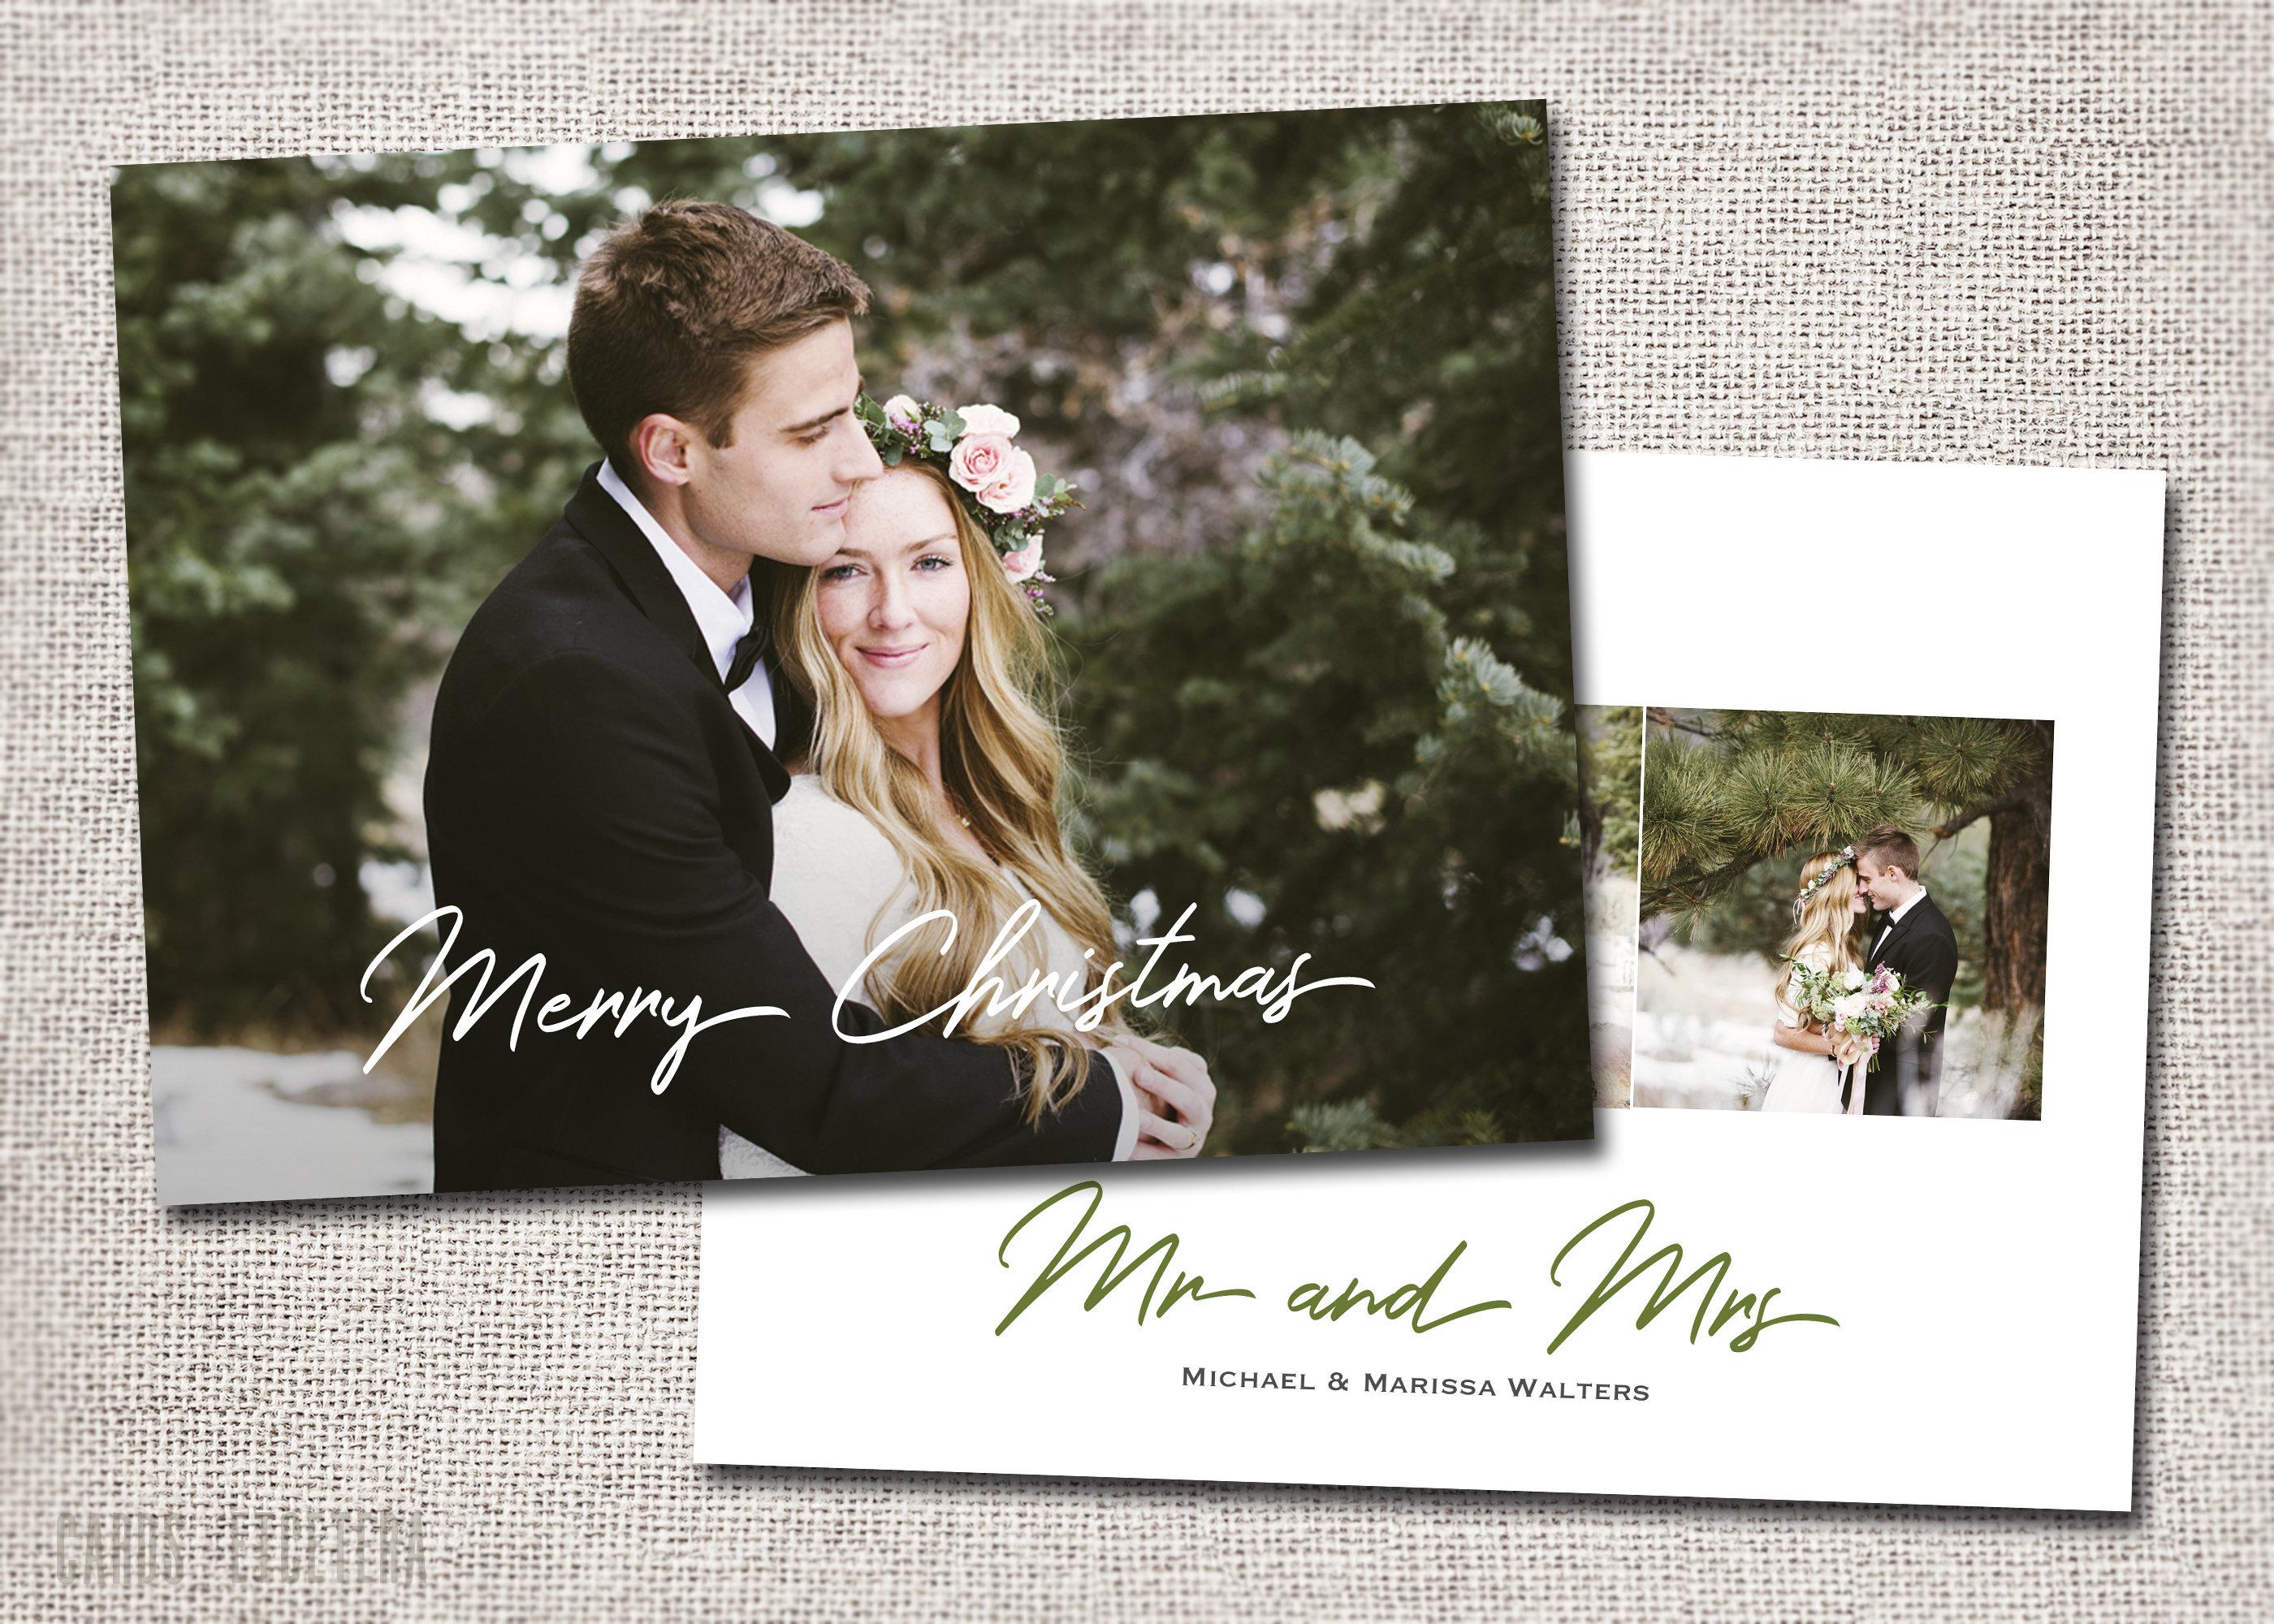 Mr and Mrs Christmas card, First Christmas, Married, Wedding Christmas Card, Photo, Just Married Christmas Card: PRINTABLE - Mr and Mrs